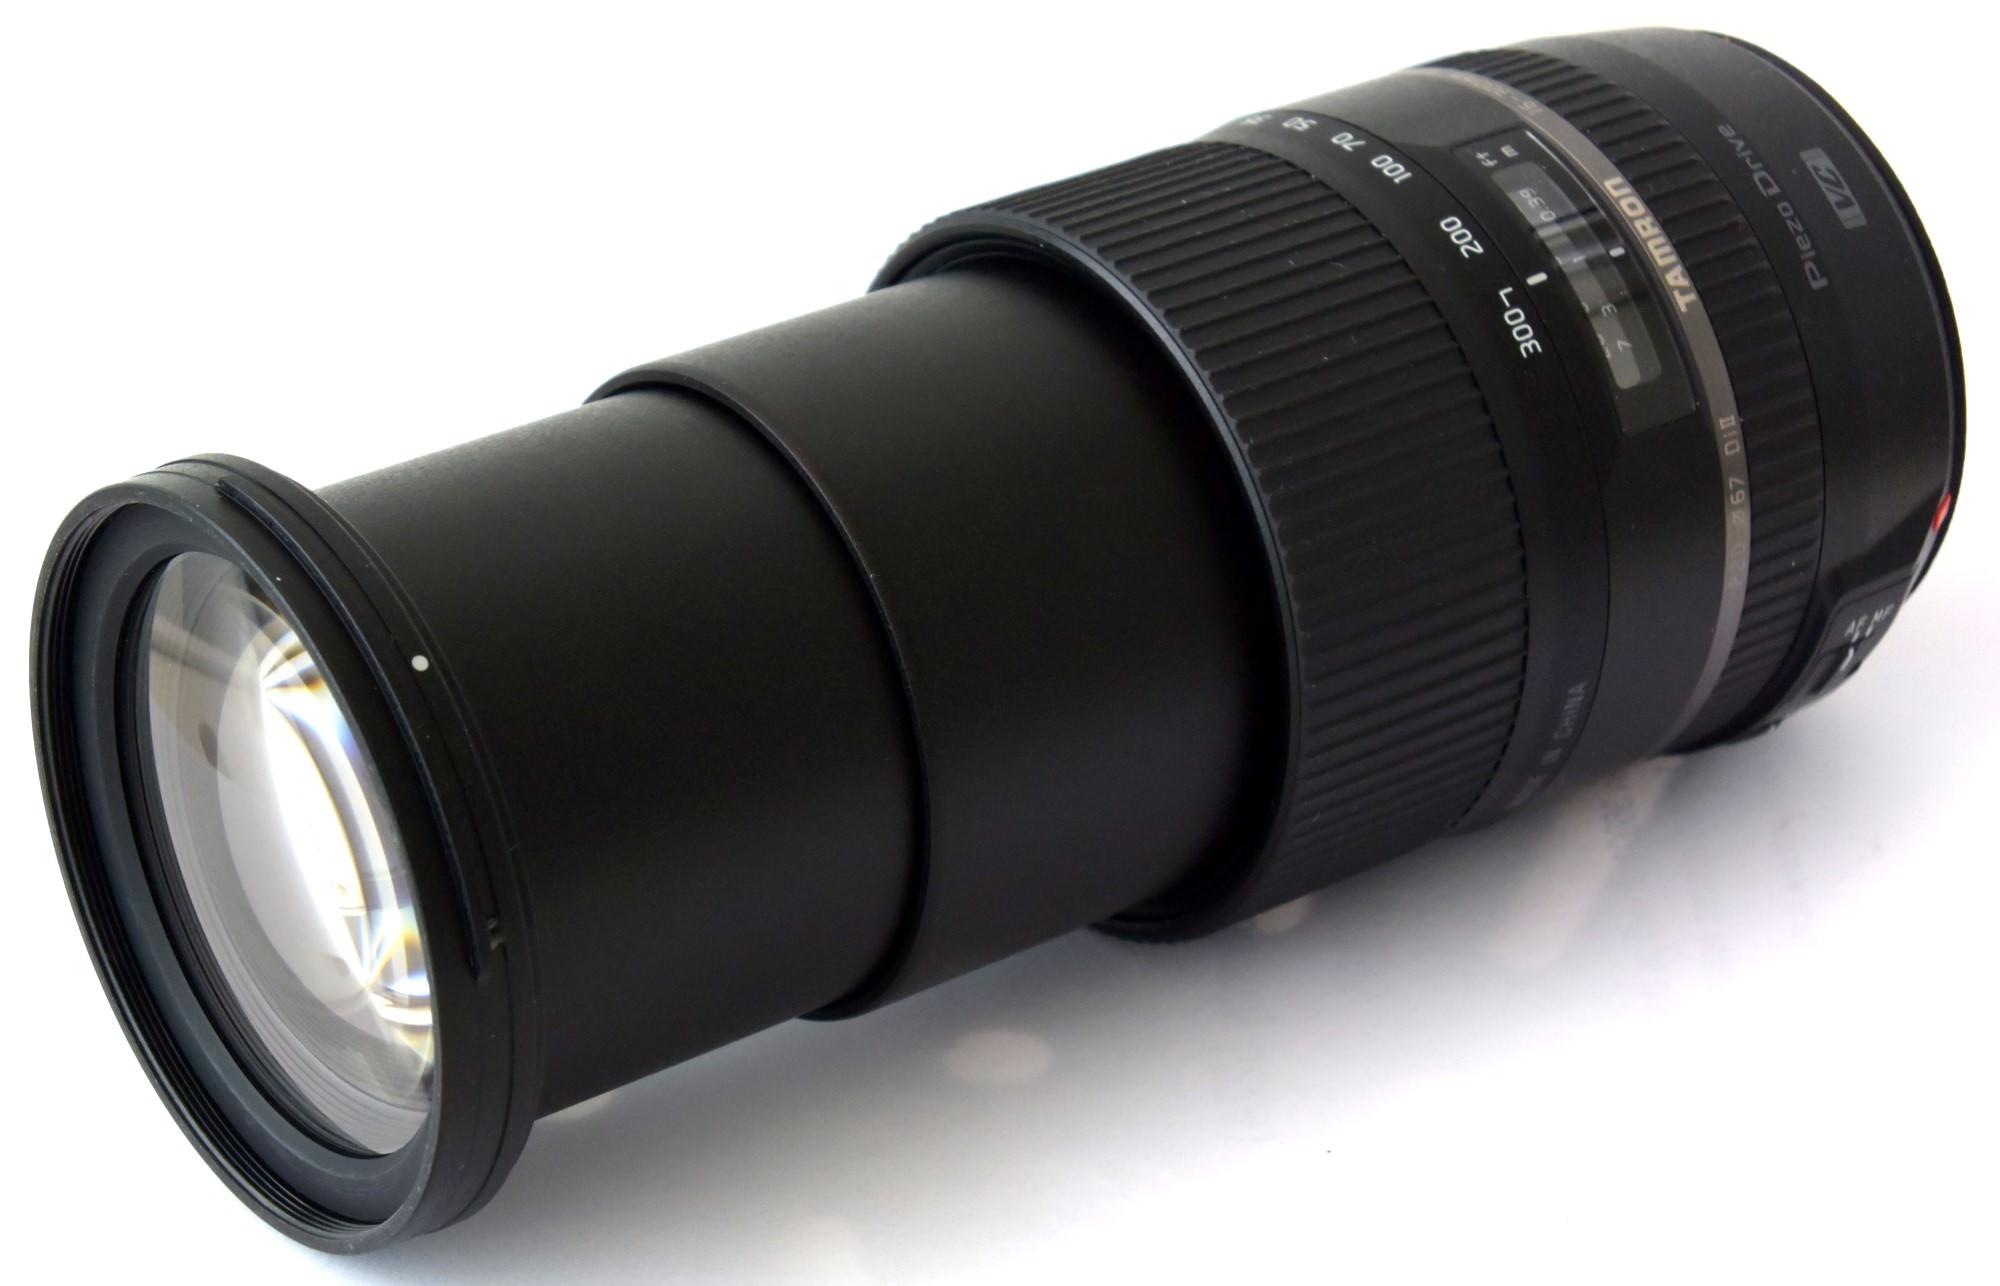 Tamron 16 300mm F 35 63 Di II VC PZD Macro Lens Expert